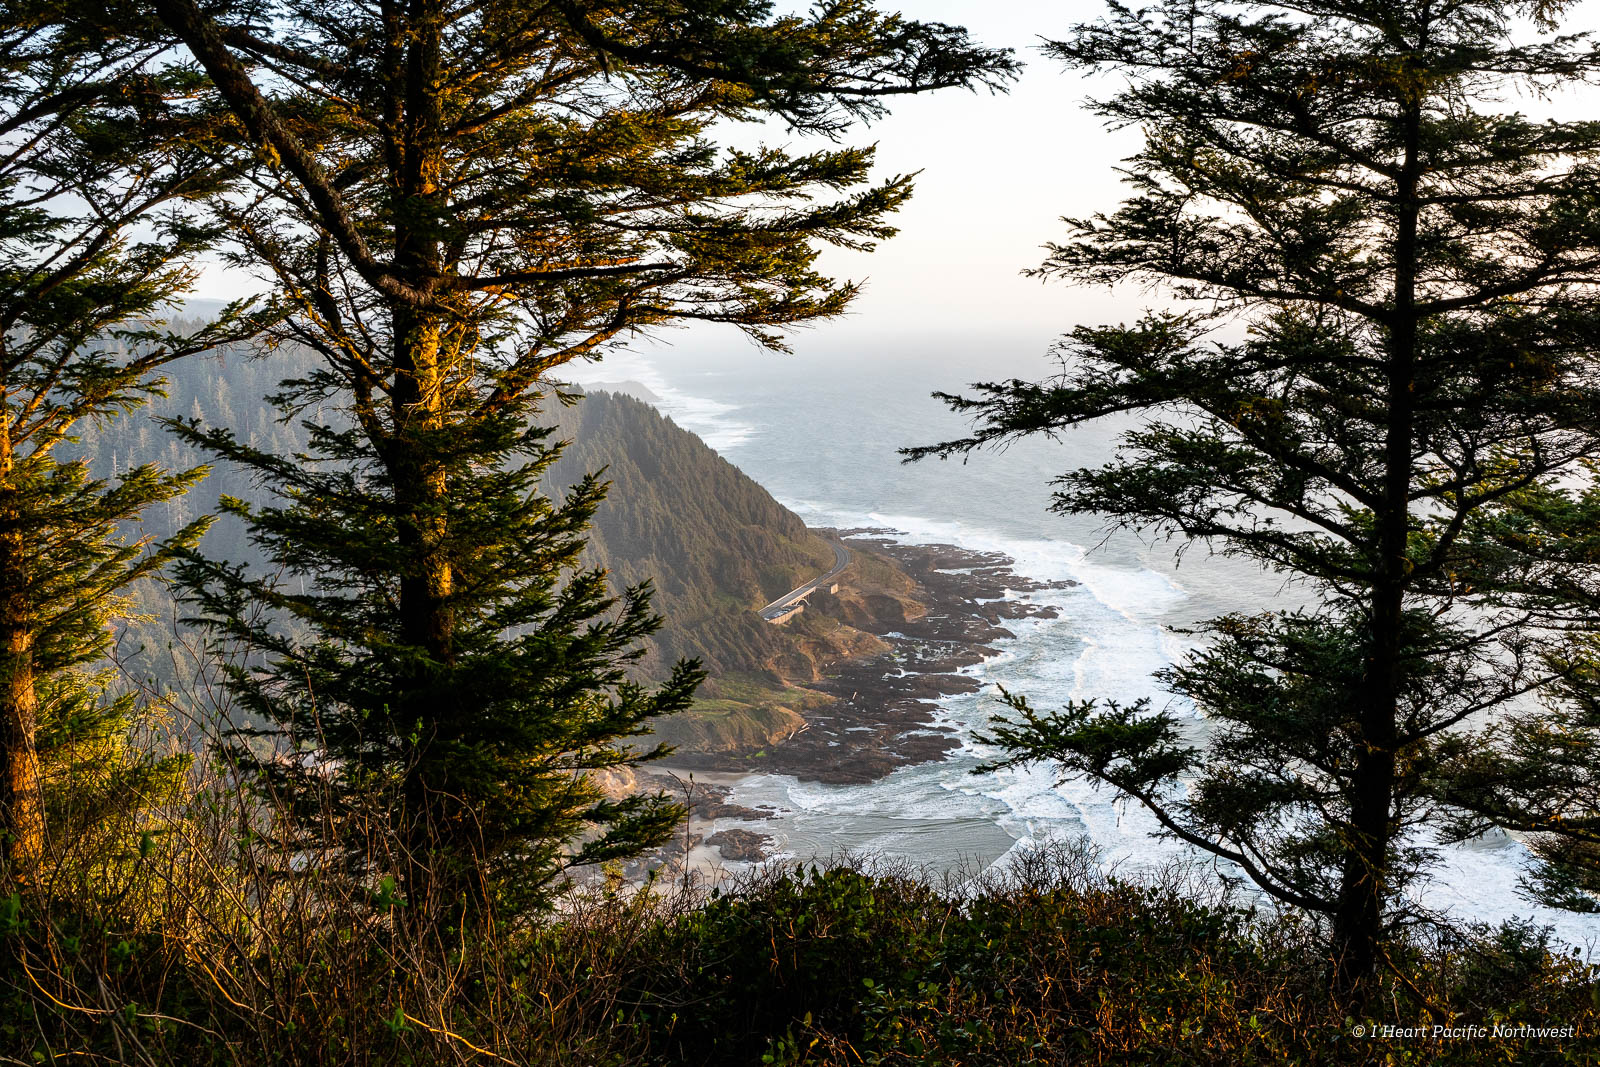 Oregon Coast: camping at Beachside & exploring Cape Perpetua